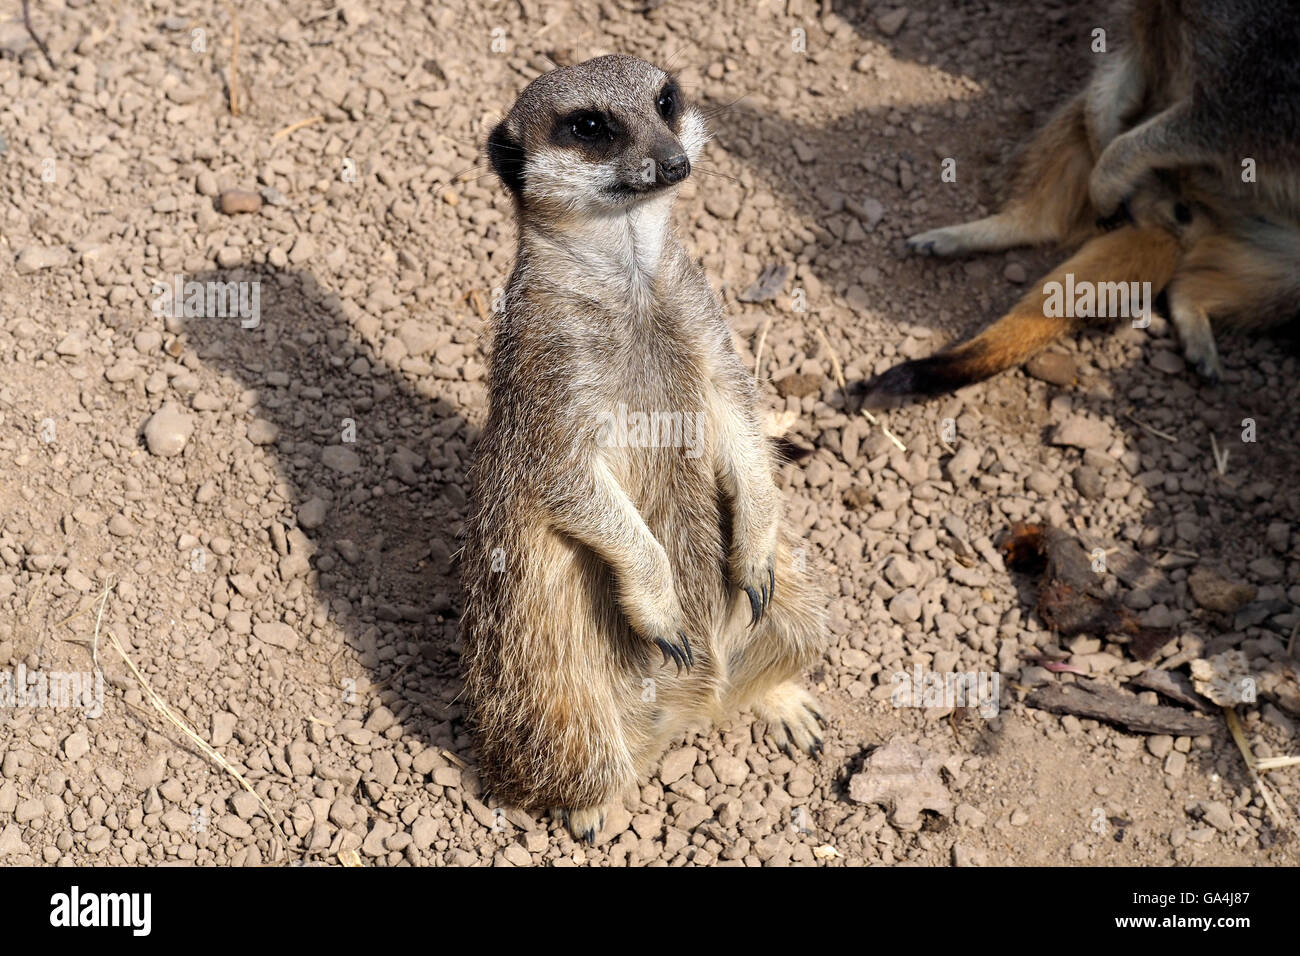 Meerkat on sentry duty - Stock Image